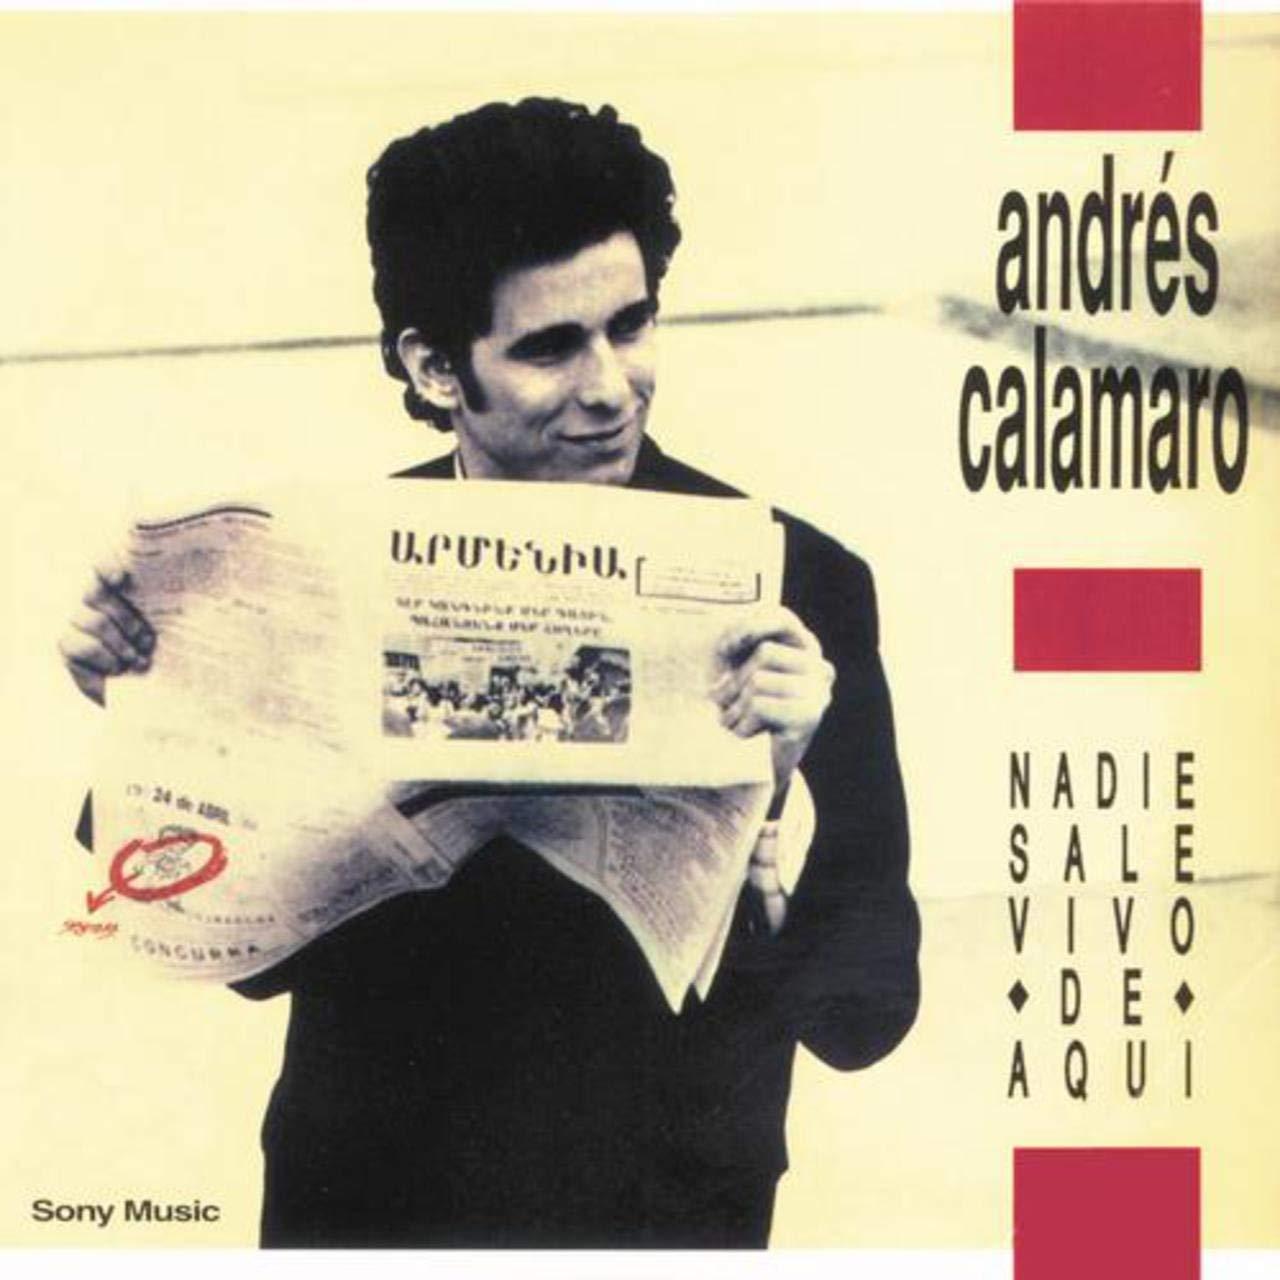 Andrés Calamaro - Nadie Sale Vivo De Aqui LP